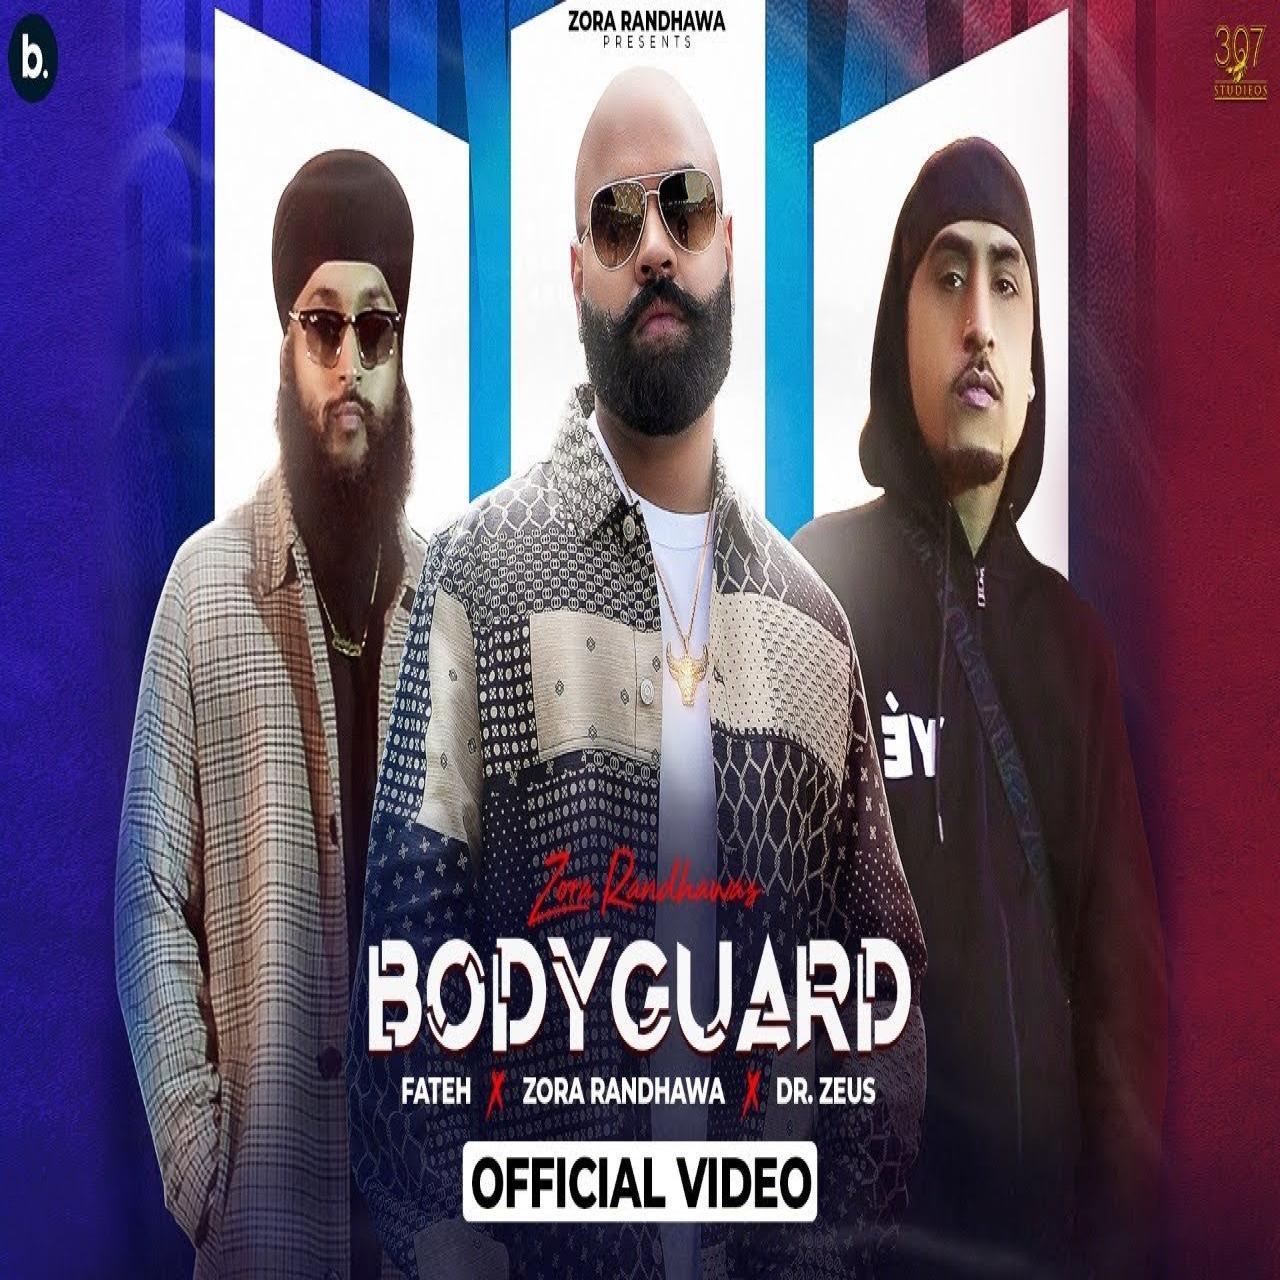 Bodyguard Zora Randhawa  Mp3 song download